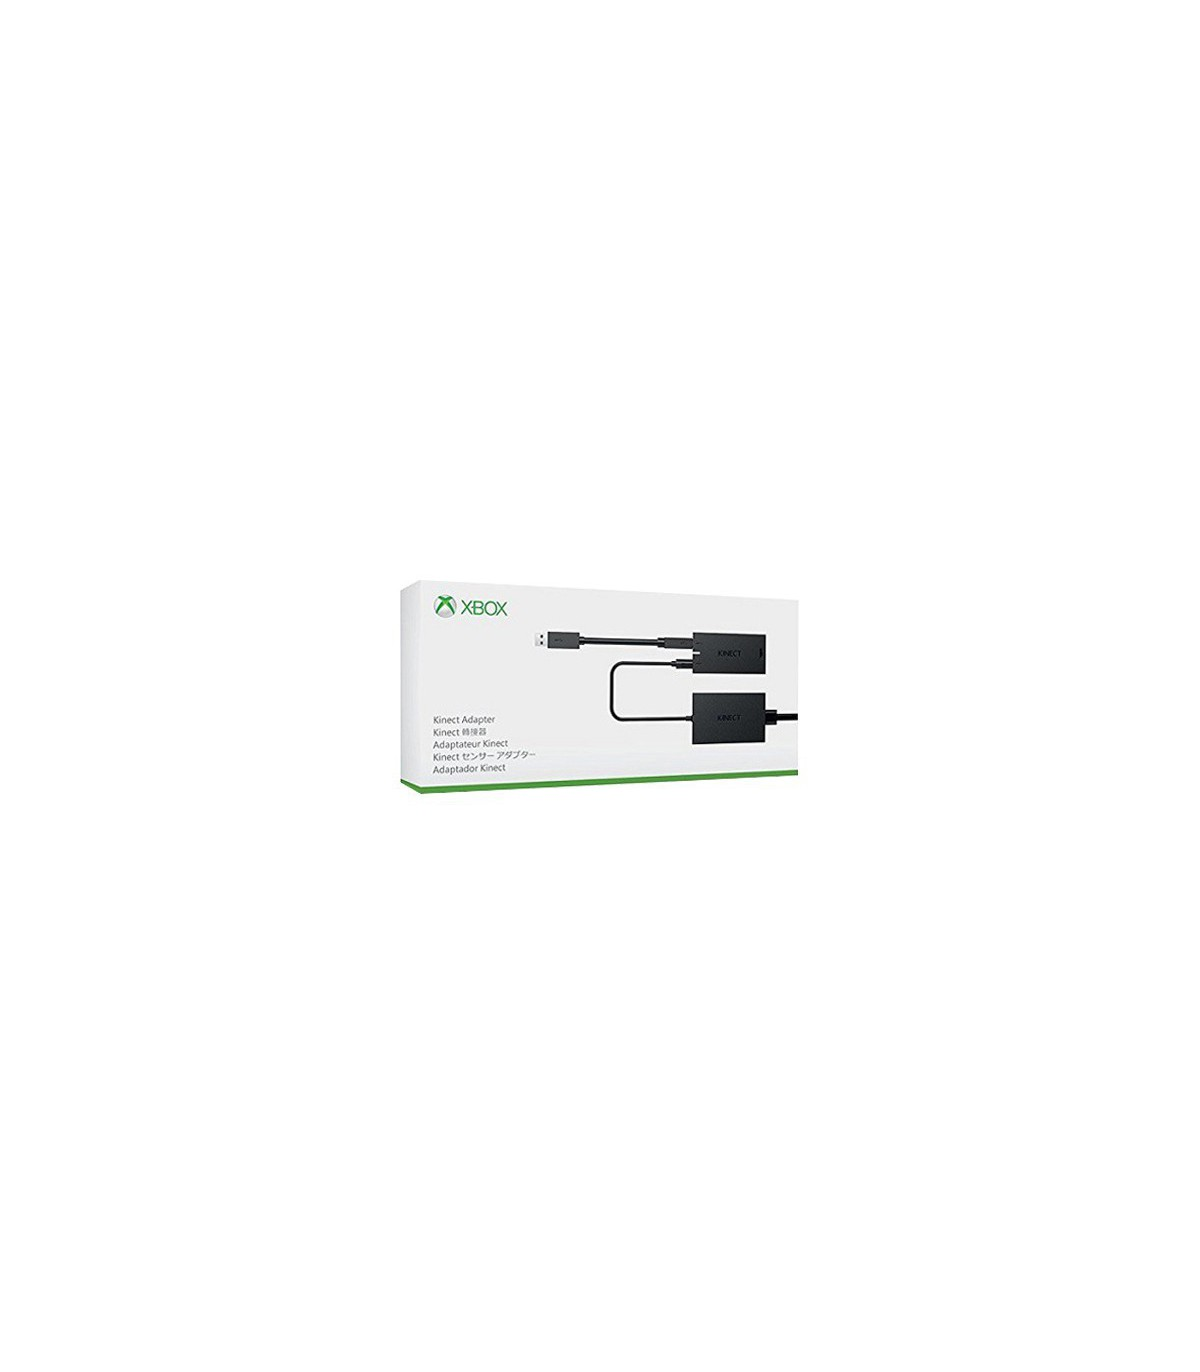 Microsoft Xbox One S Kinect Adaptor